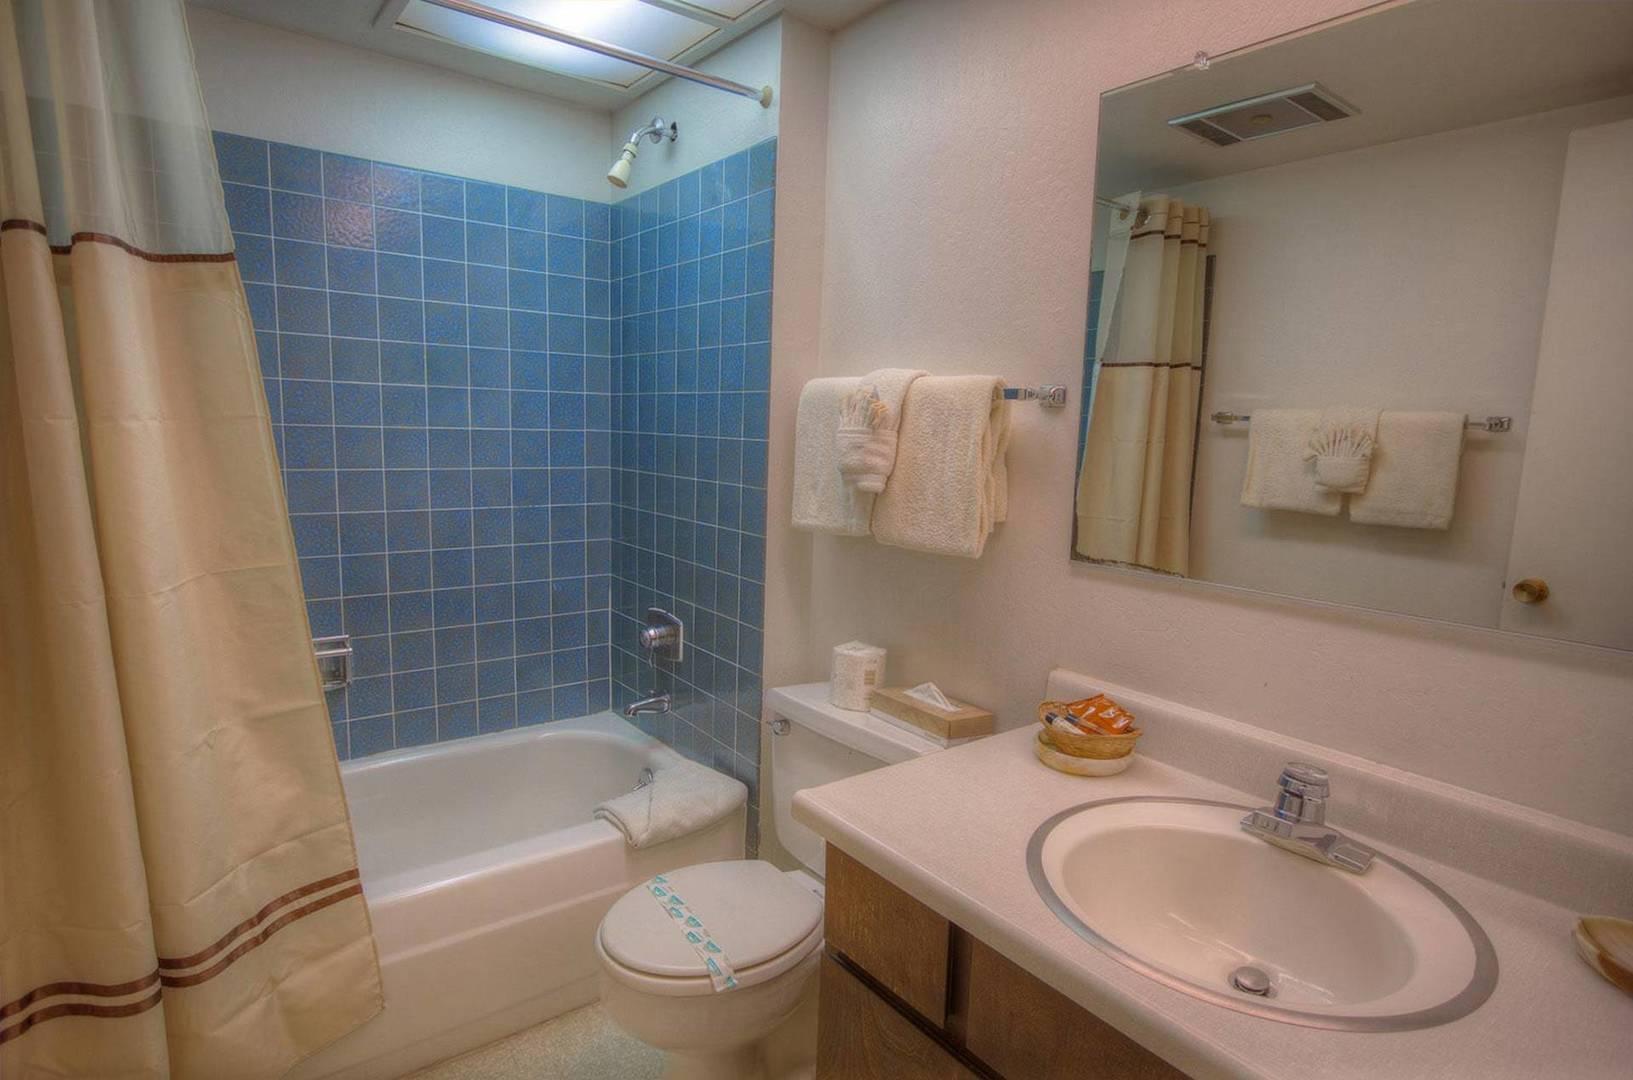 fpc0640 bathroom